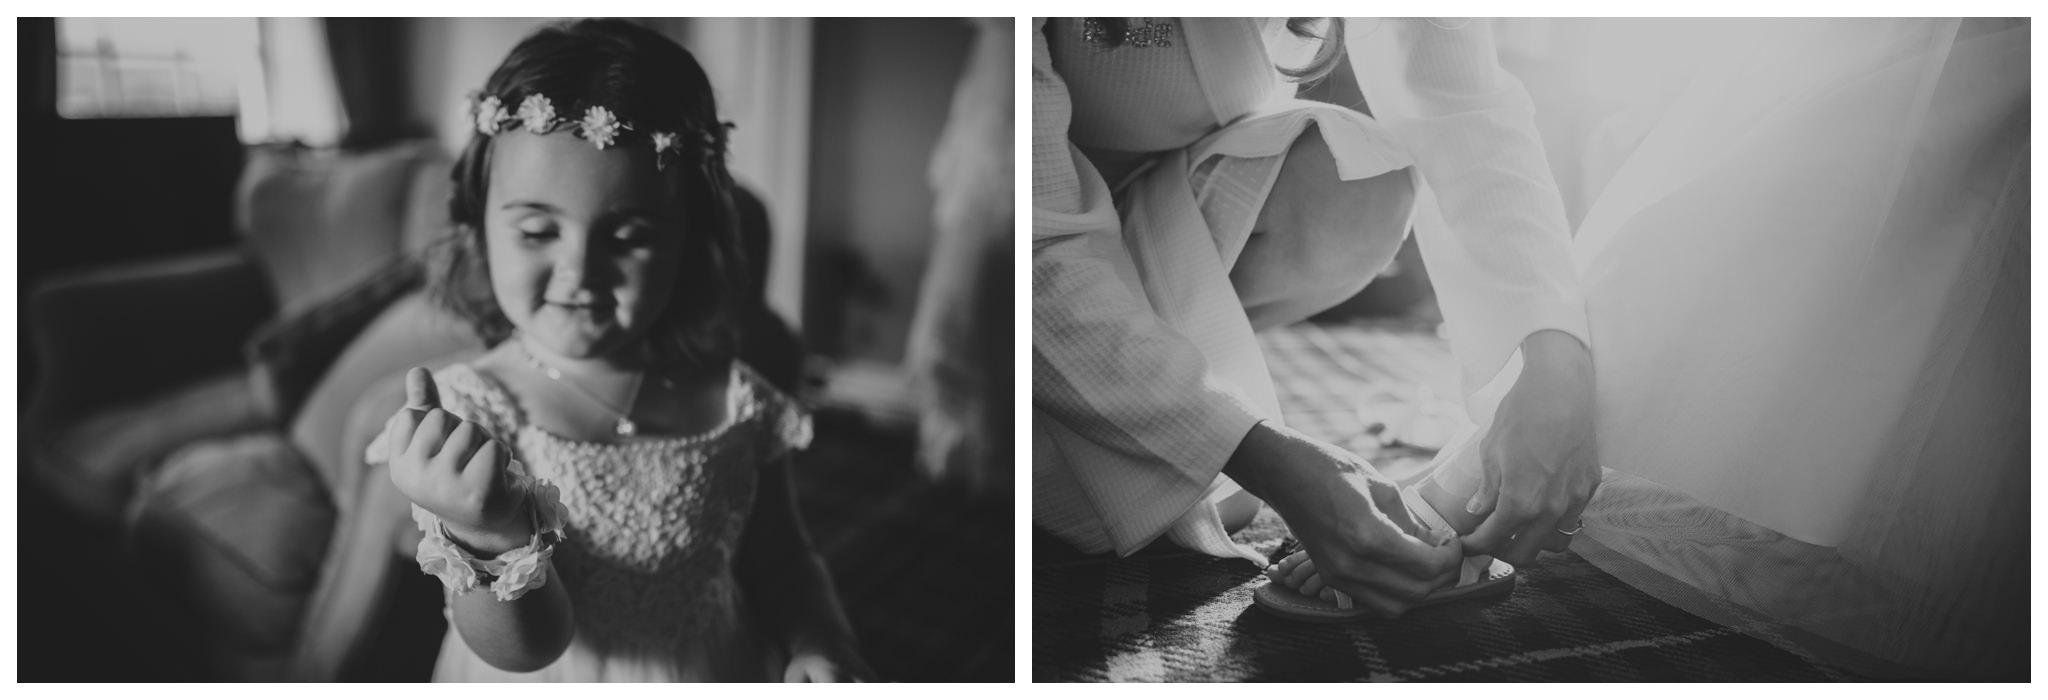 Richard Savage Photography - Wedding - Peterstone Court Brecon - 2016-05-11_0012